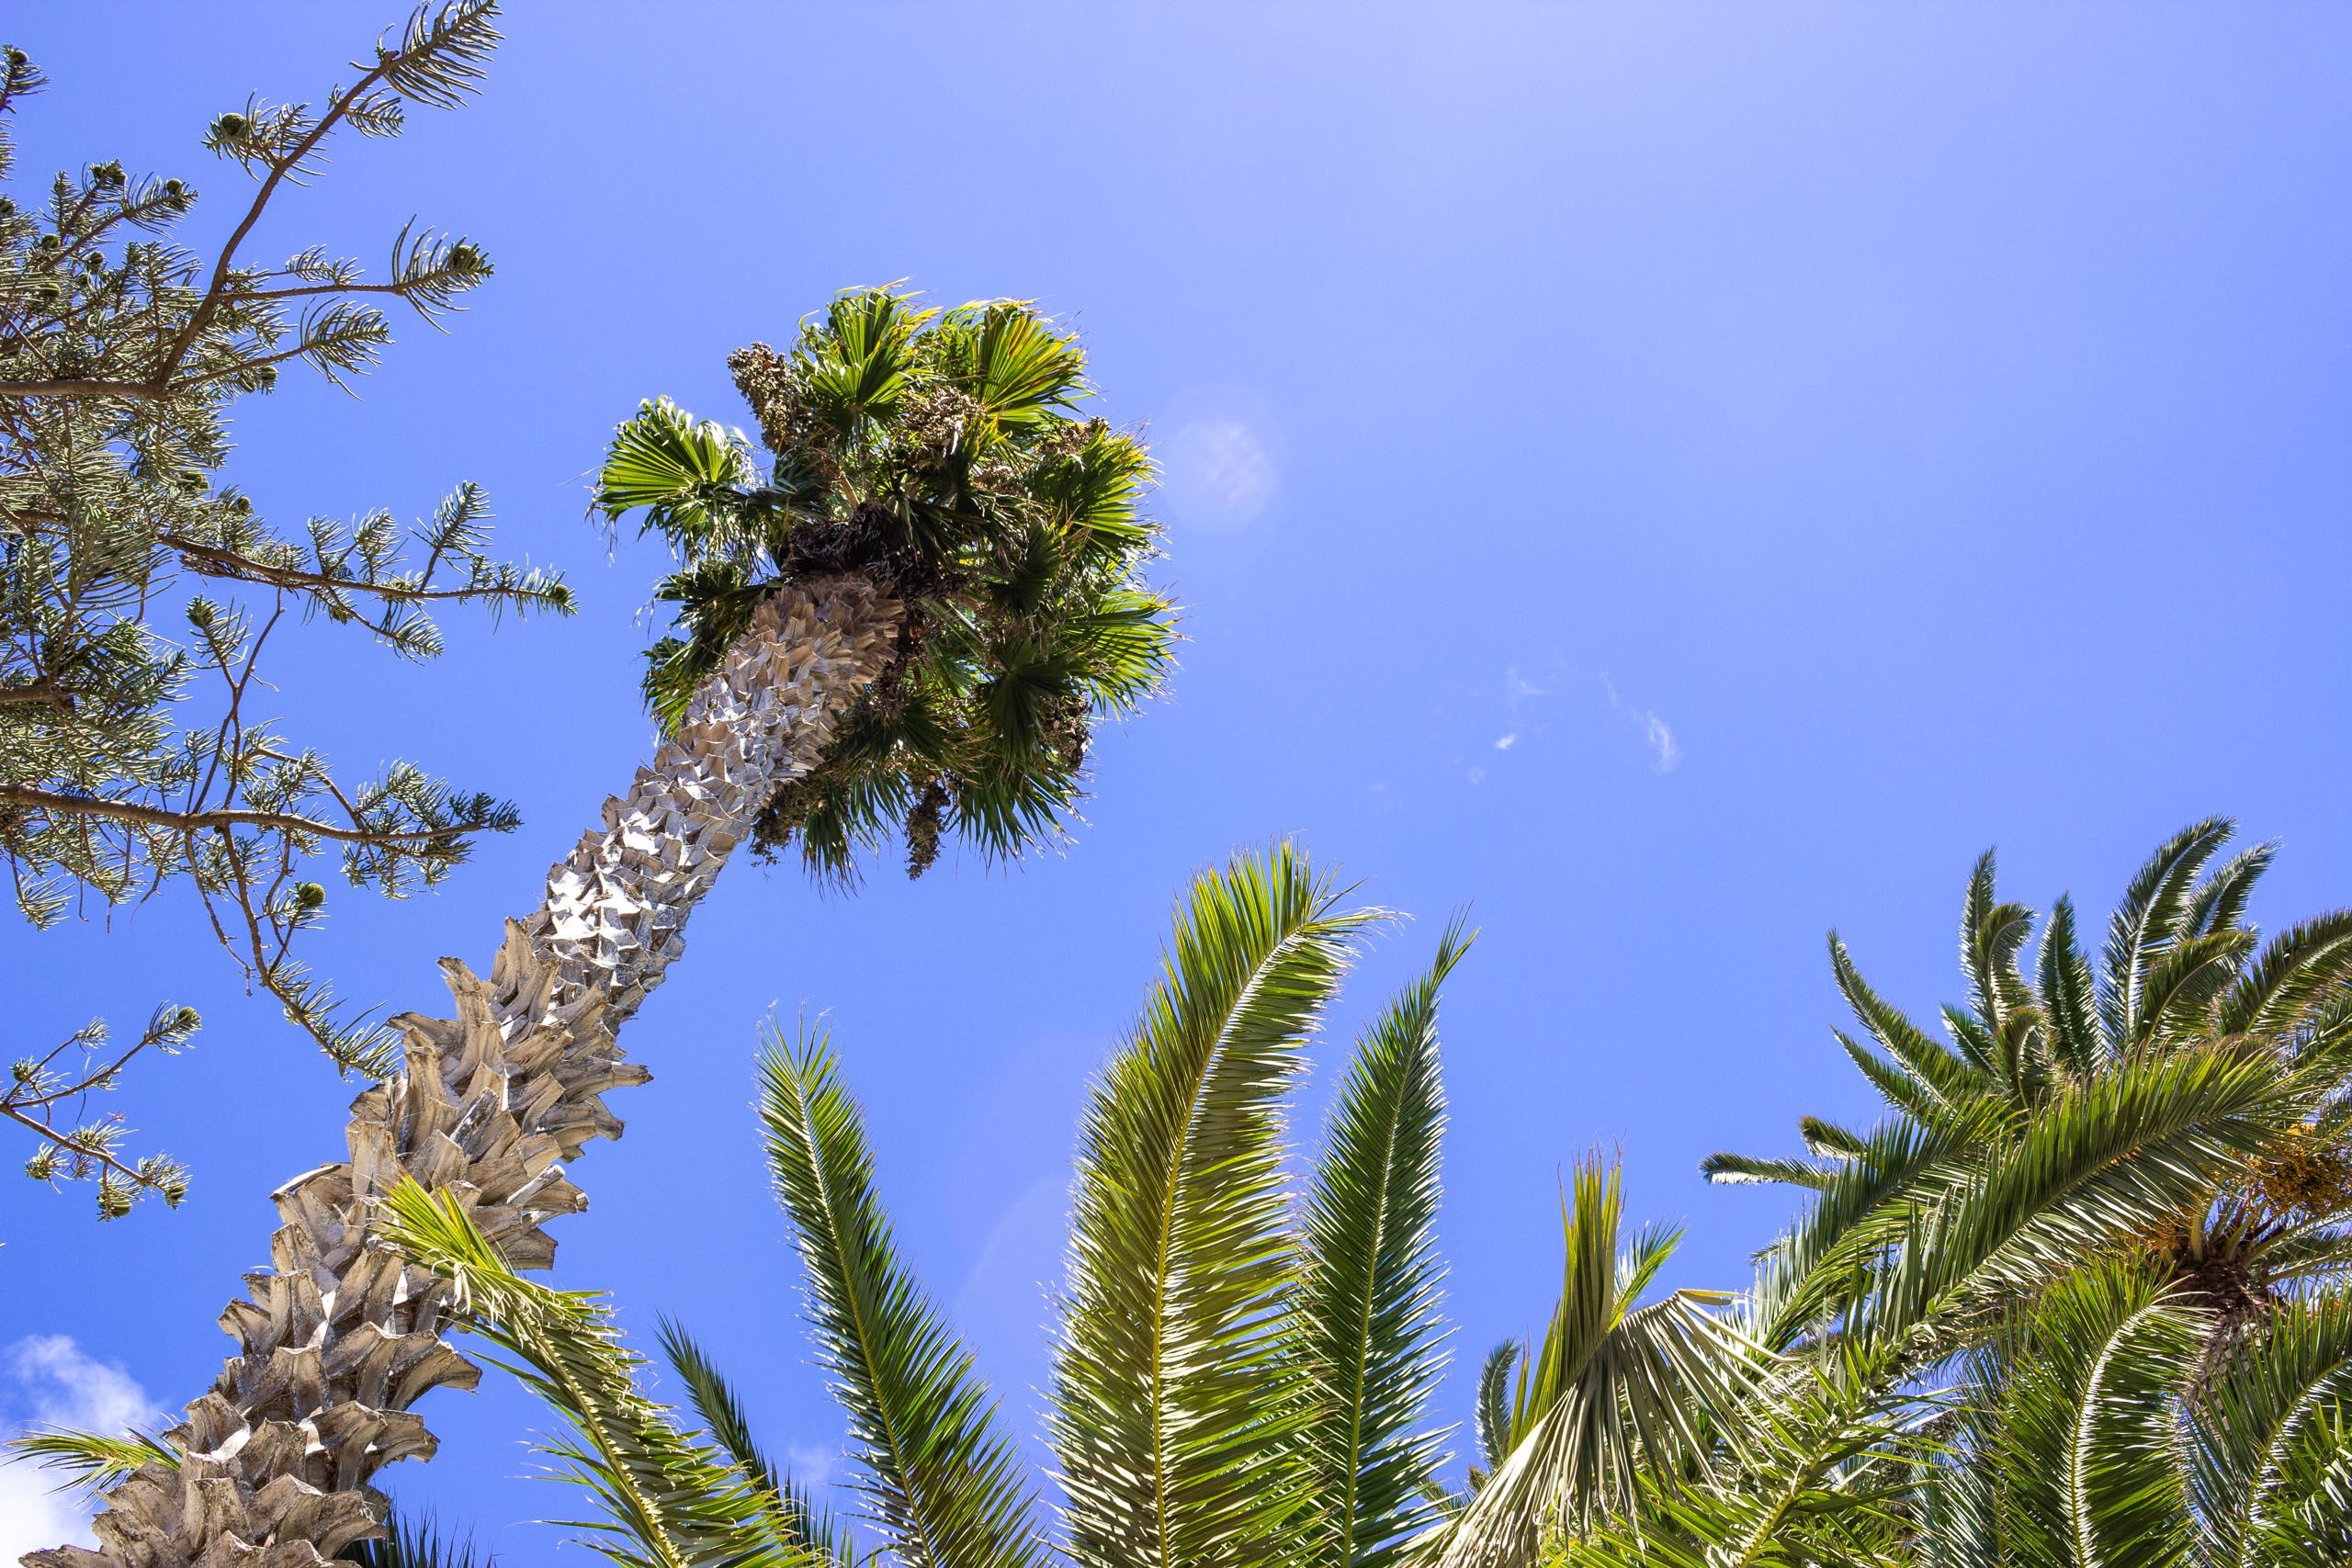 2015 09 Lanzarote PalmTrees 004